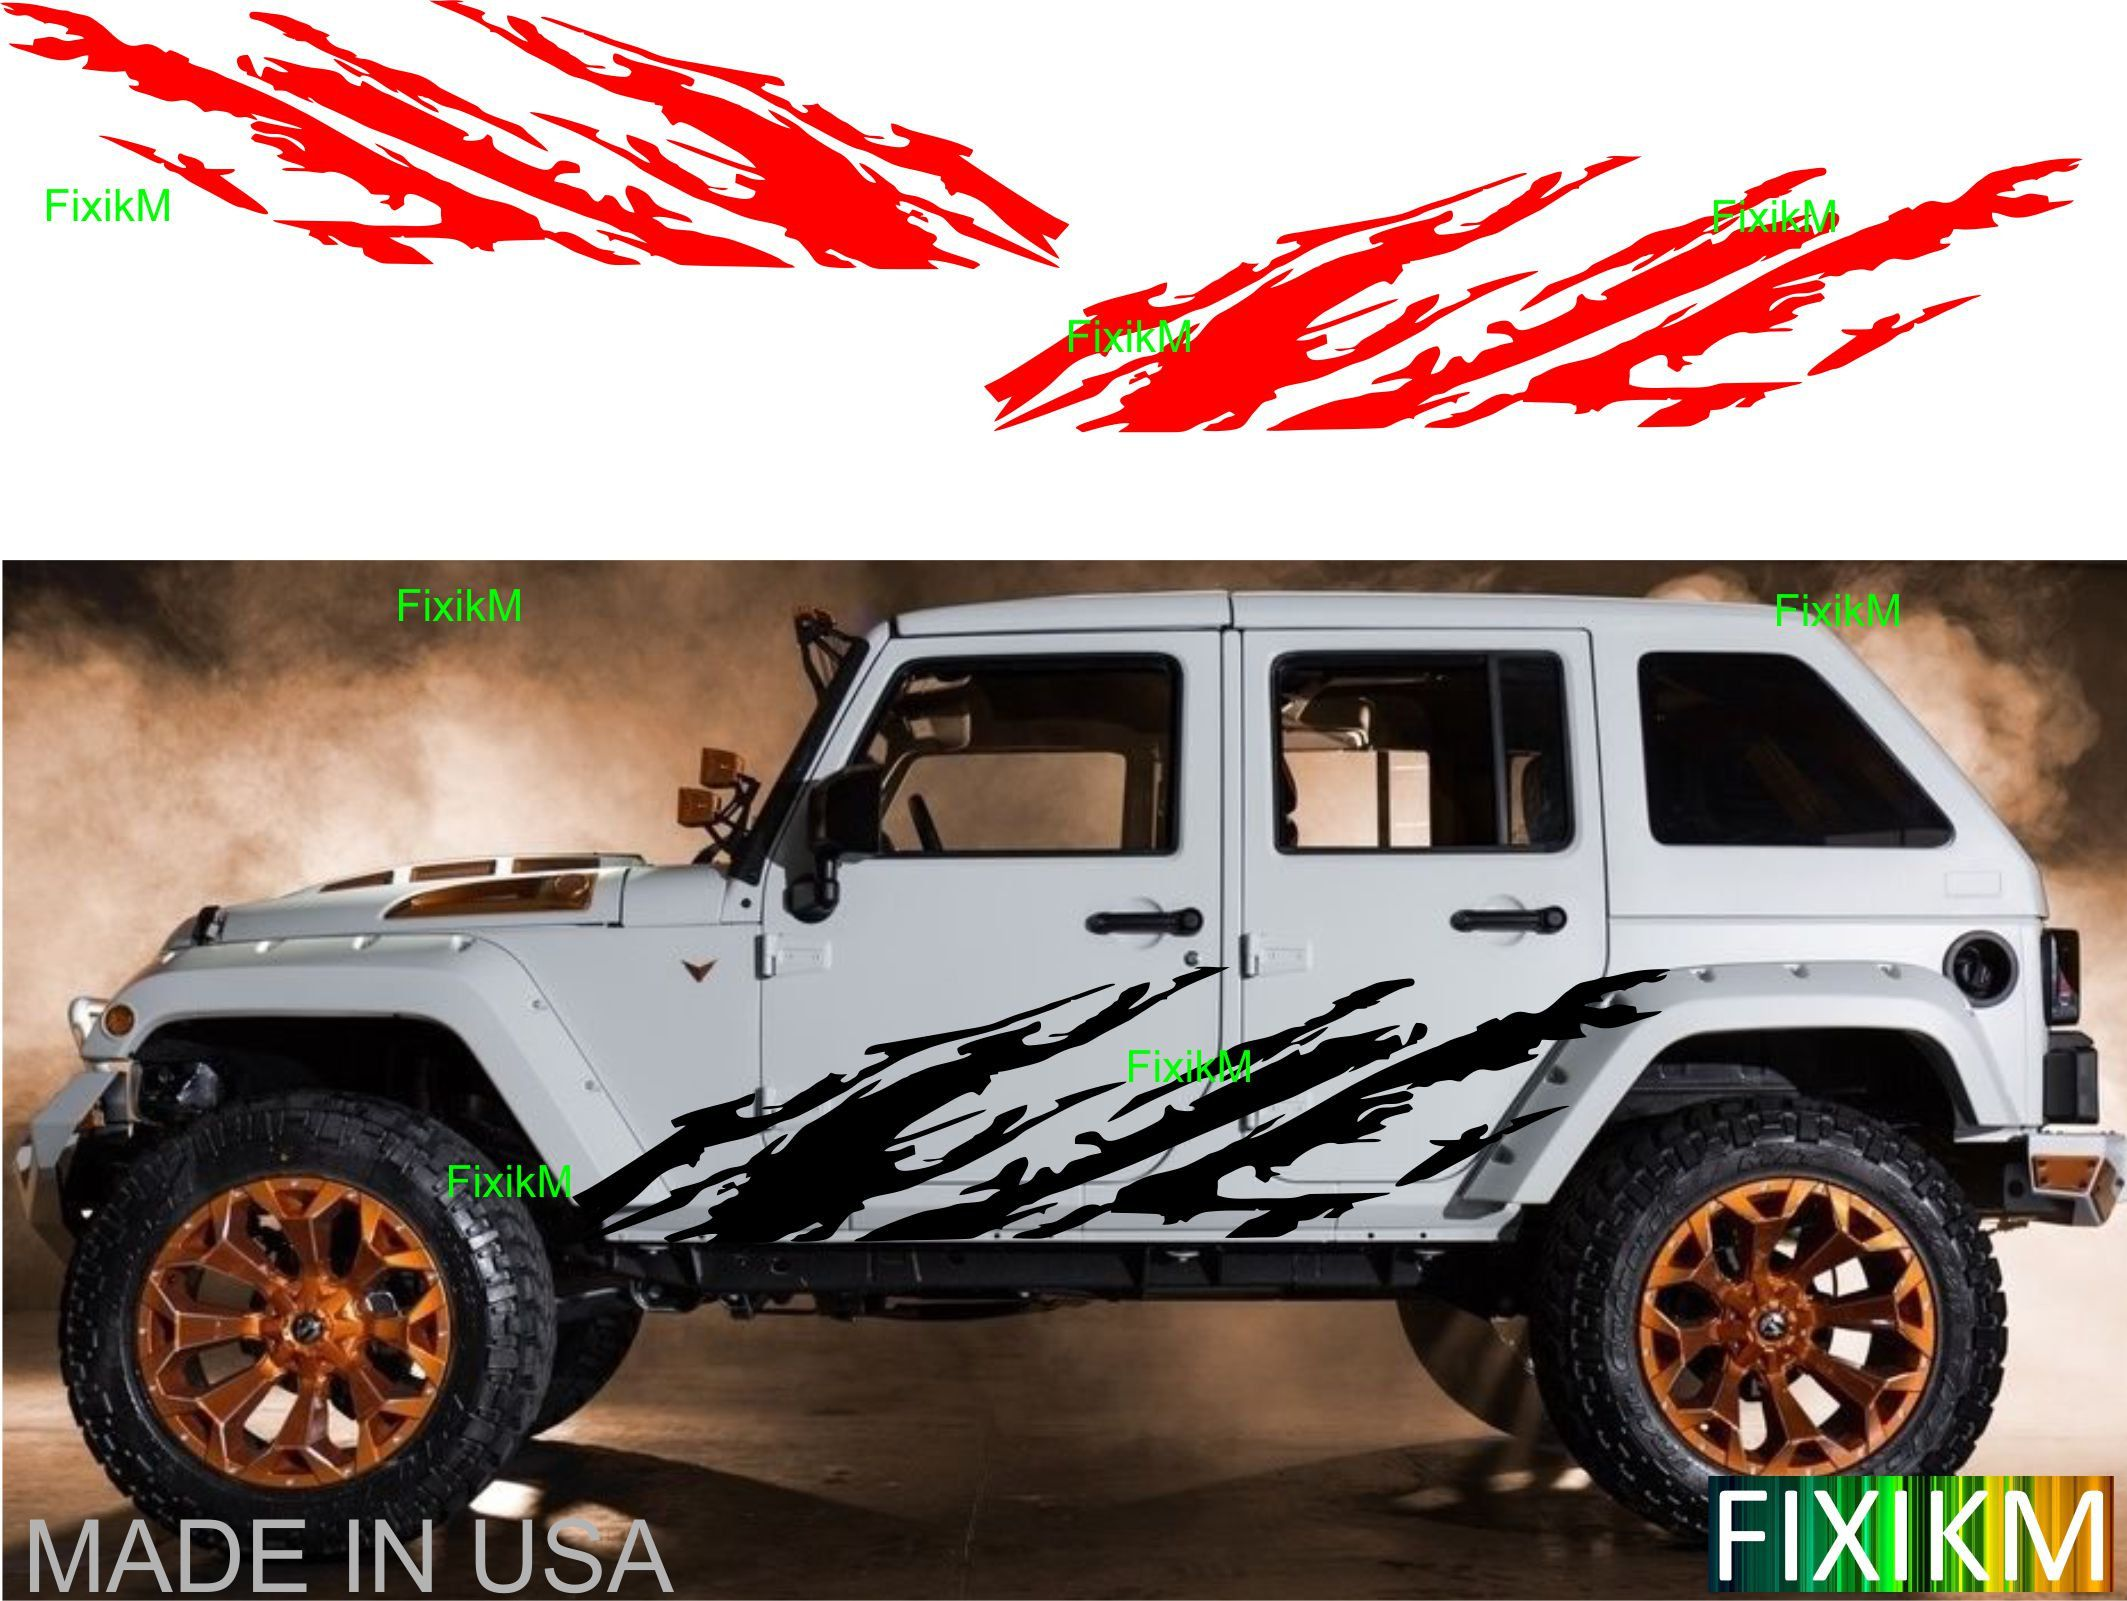 Large Mud Splash Side Graphics Vinyl Decal Stickers Universal Etsy In 2020 Jeep Decals Vinyl Graphics Trucks